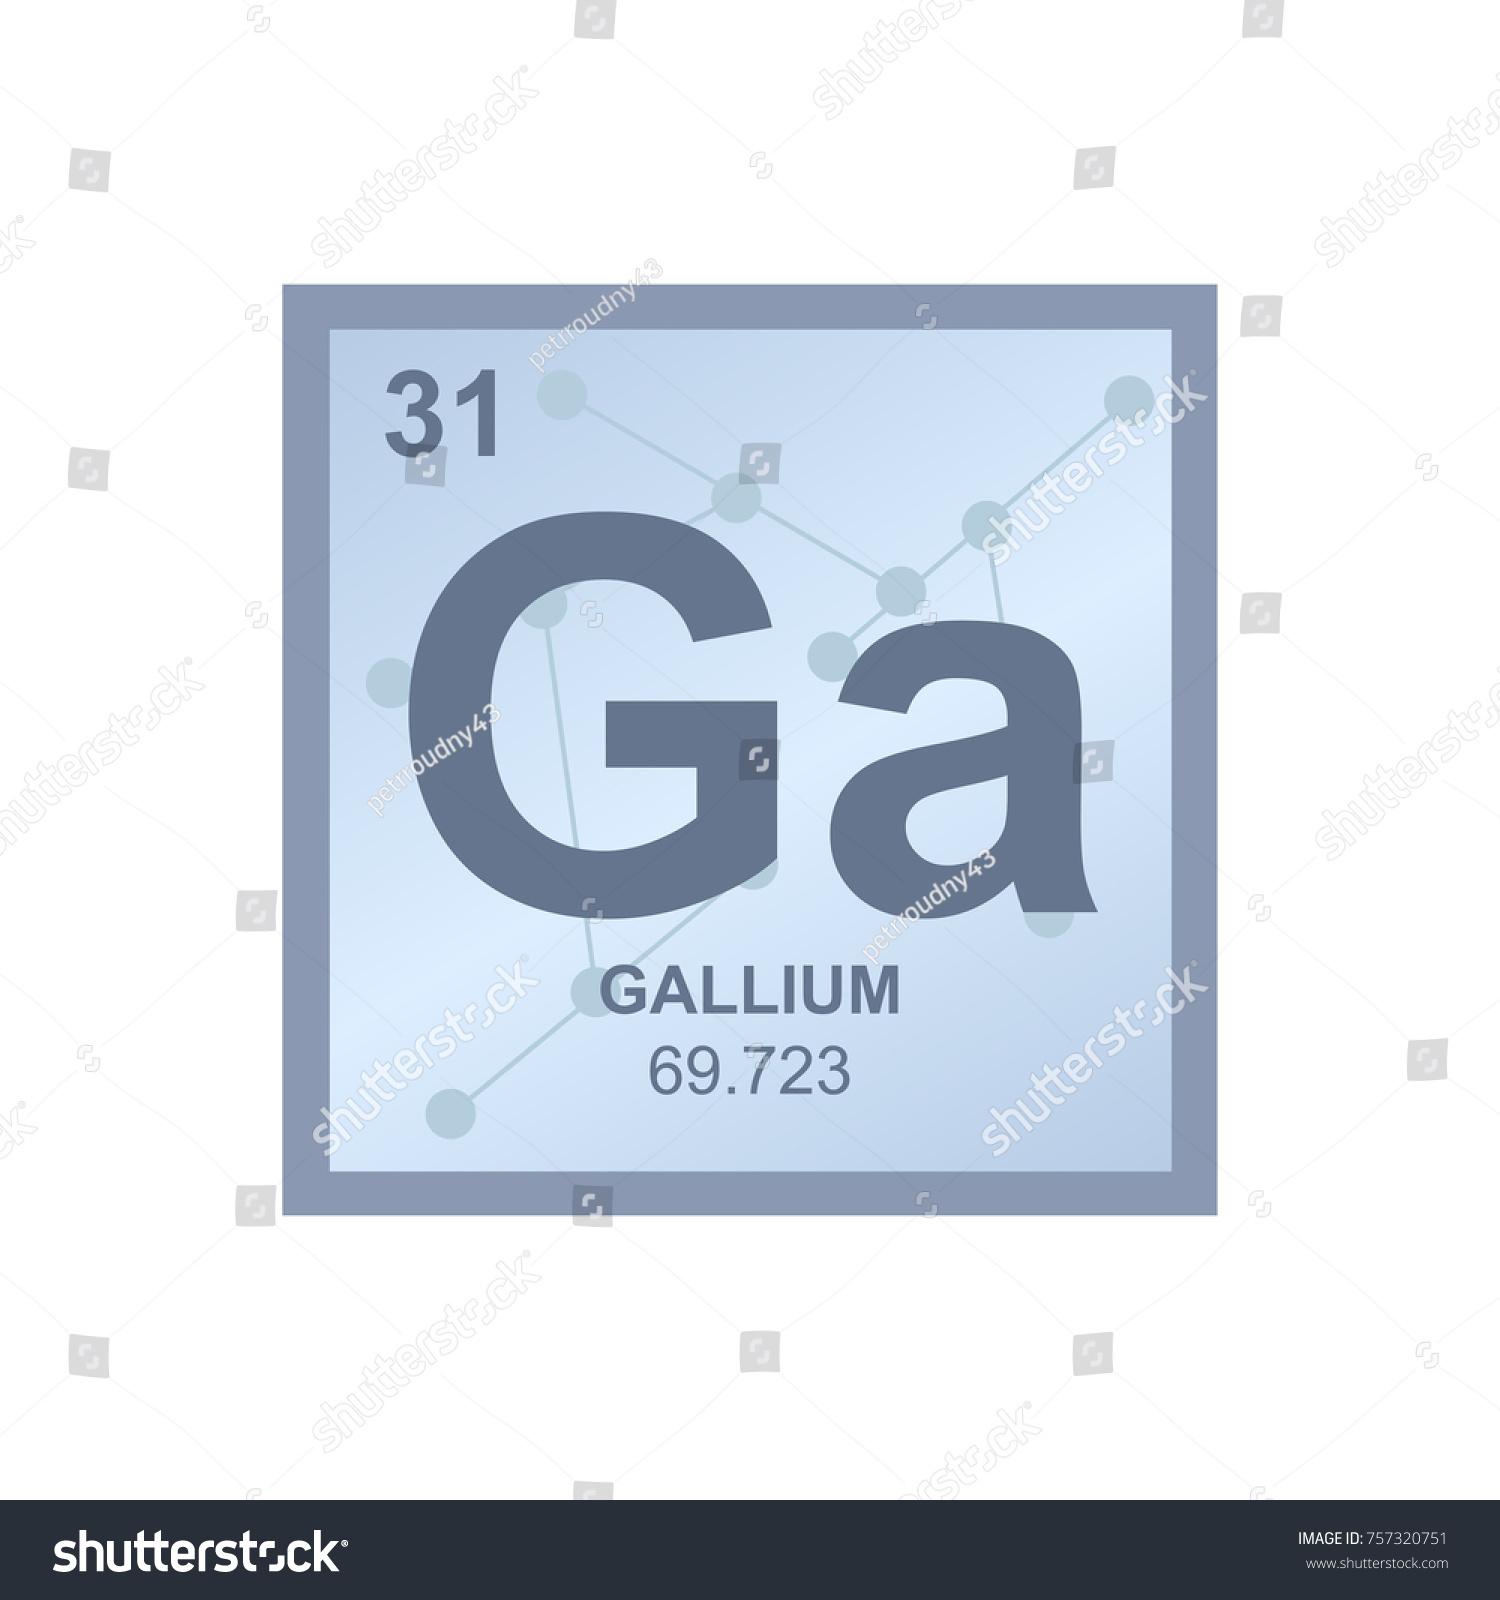 Vector symbol gallium periodic table elements stock vector vector symbol of gallium from the periodic table of the elements on the background from connected gamestrikefo Gallery